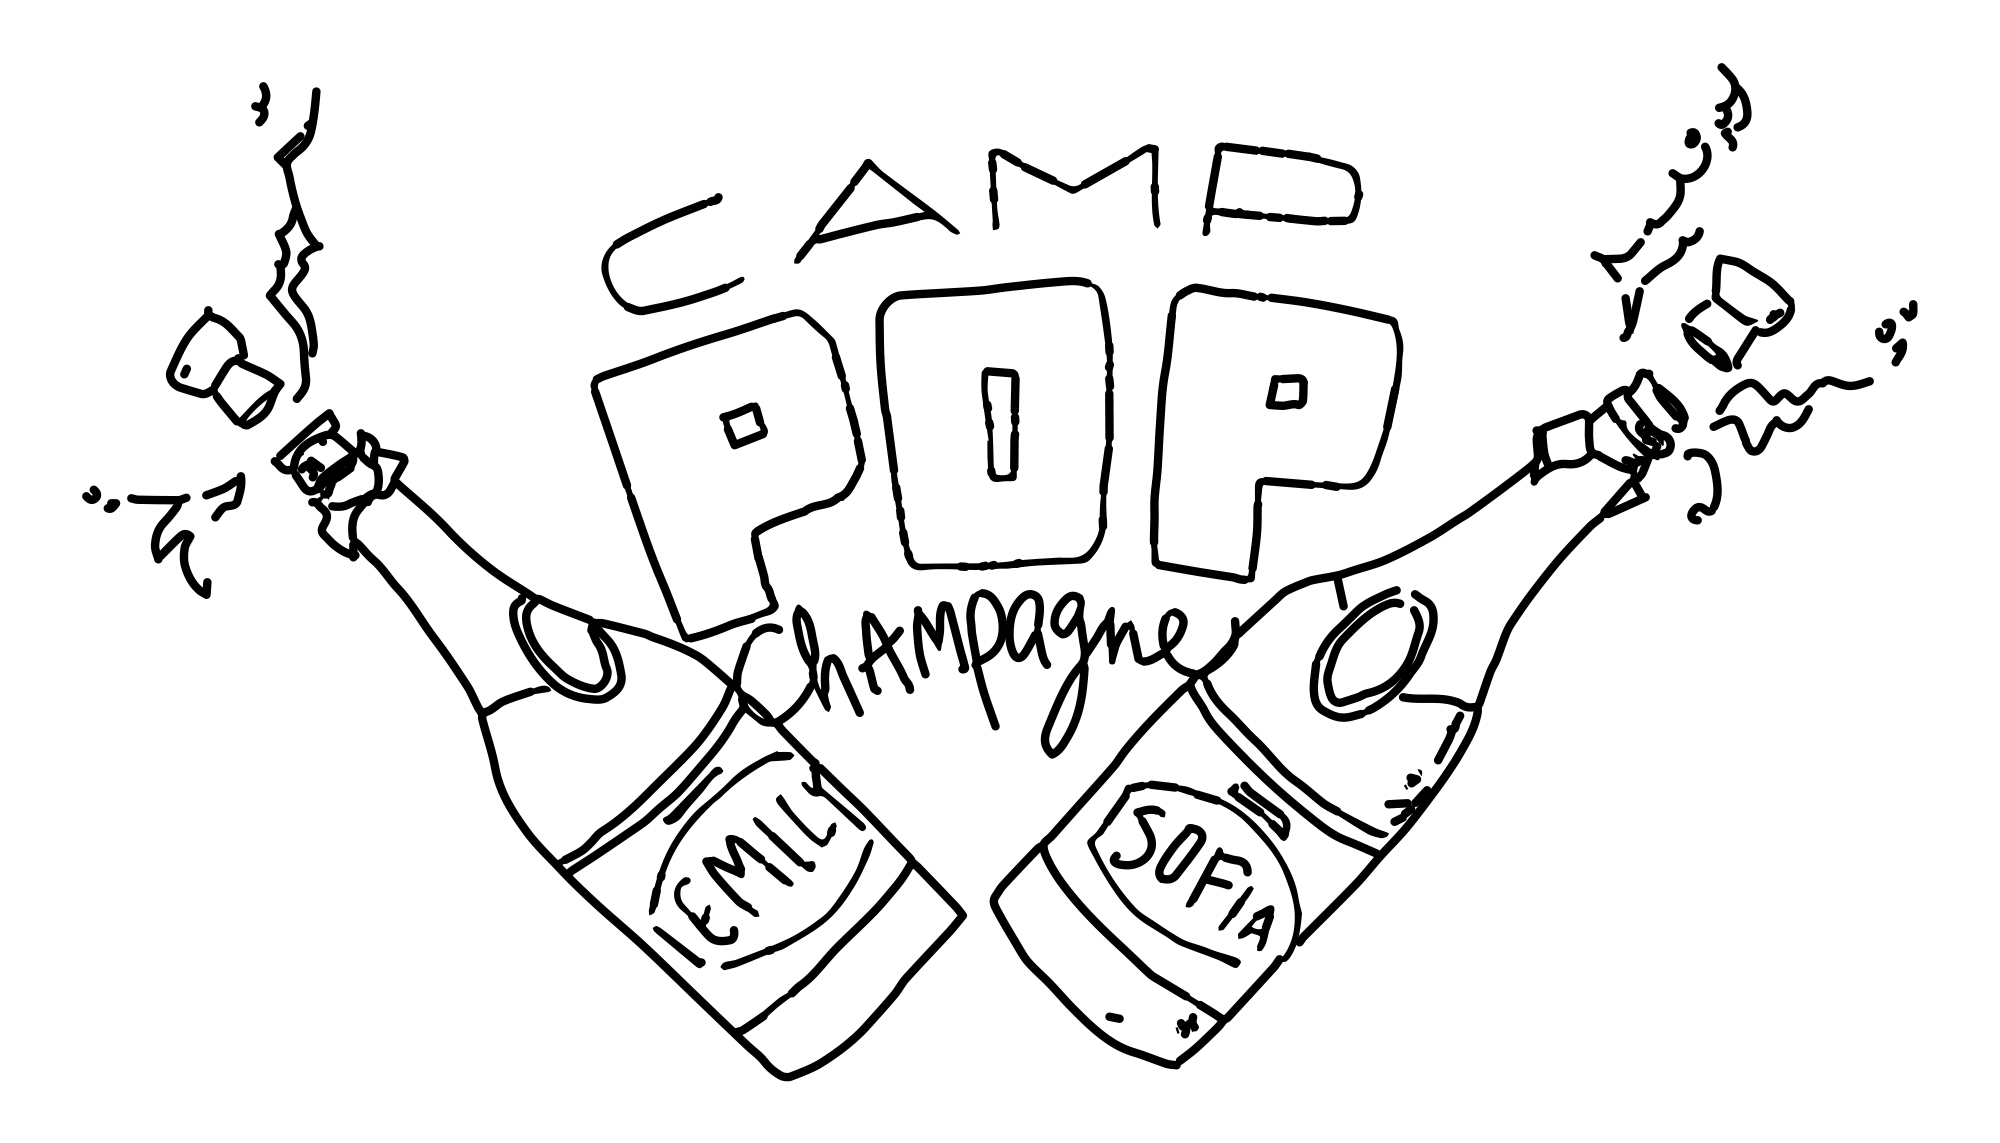 Wedding logo #CampPopChampagne